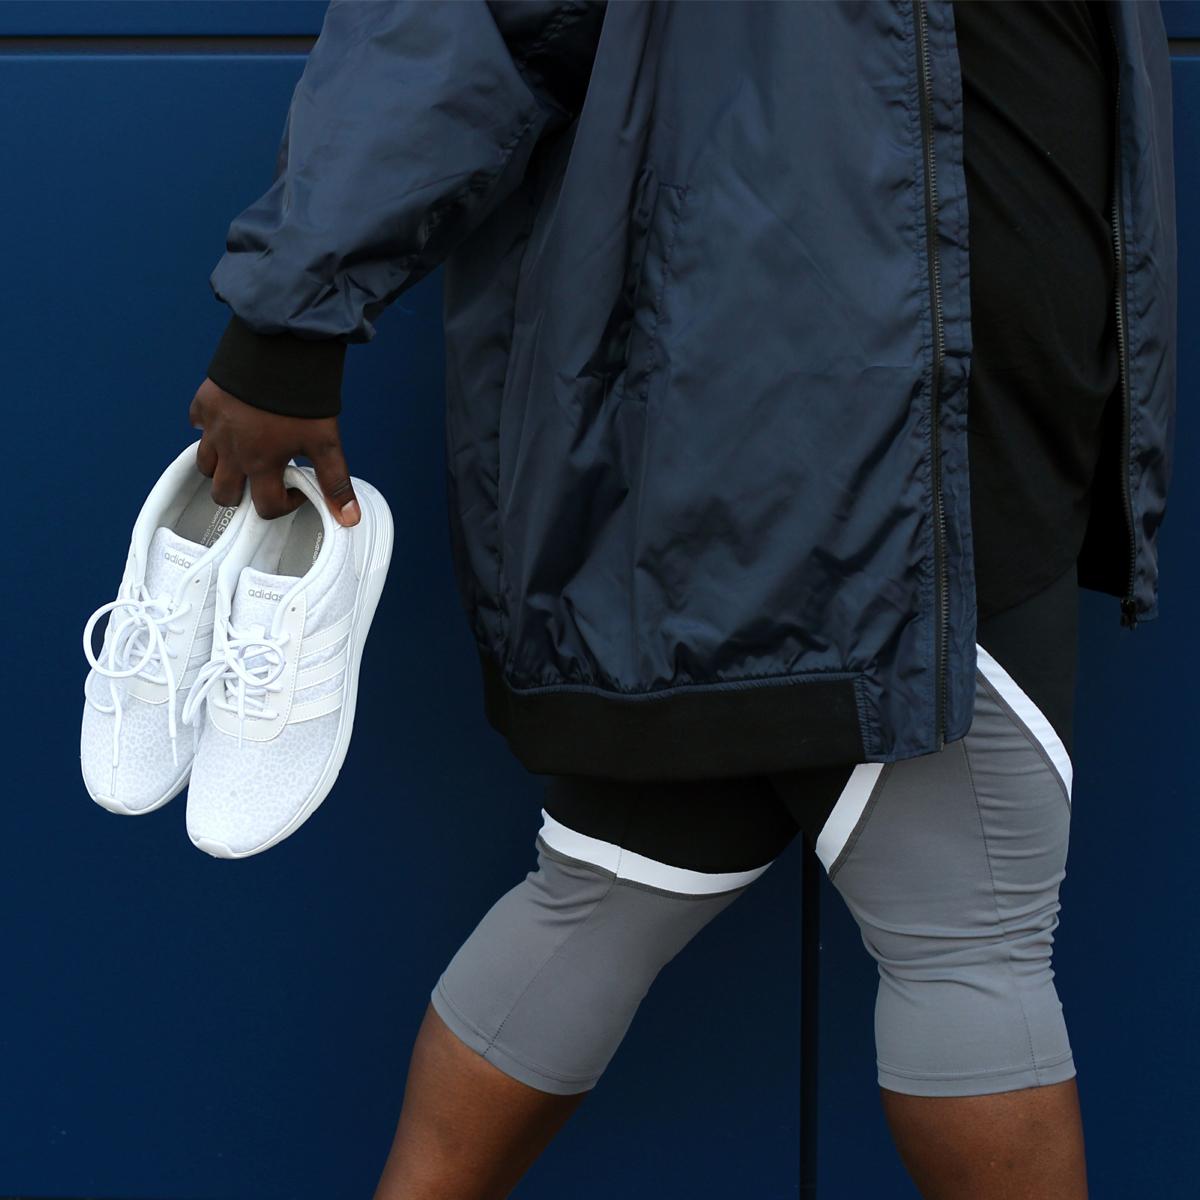 plus size fitness, plus size fitness gear, plus size activewear, simplybe plus size activewear 02a